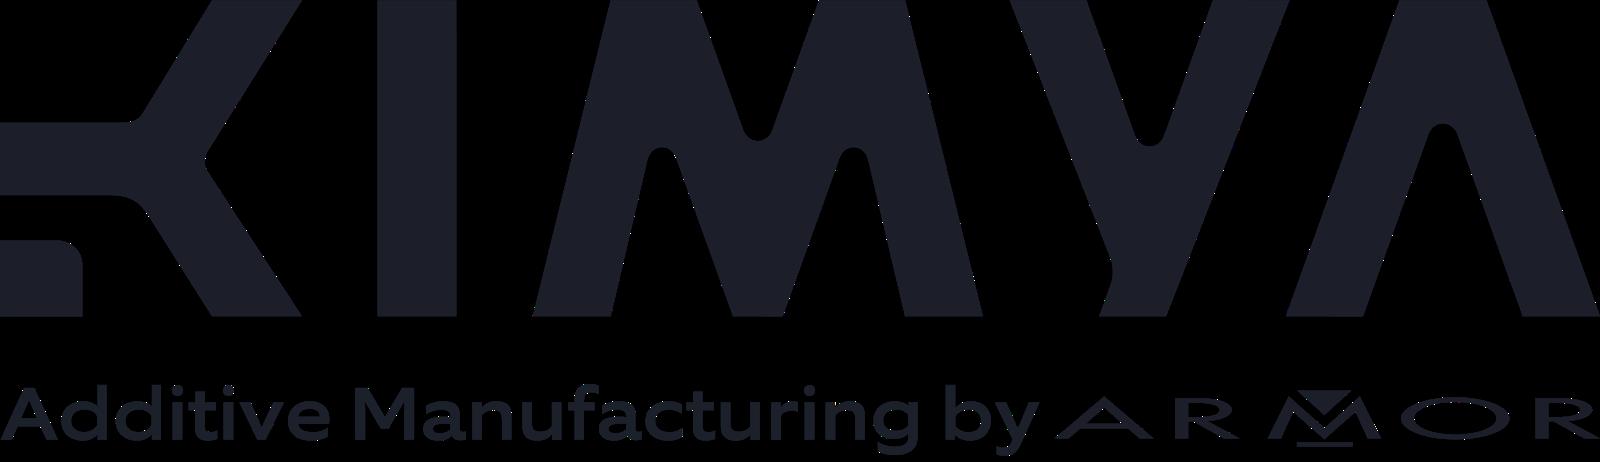 Logo_Kimya_Additive Manufacturing by ARMOR